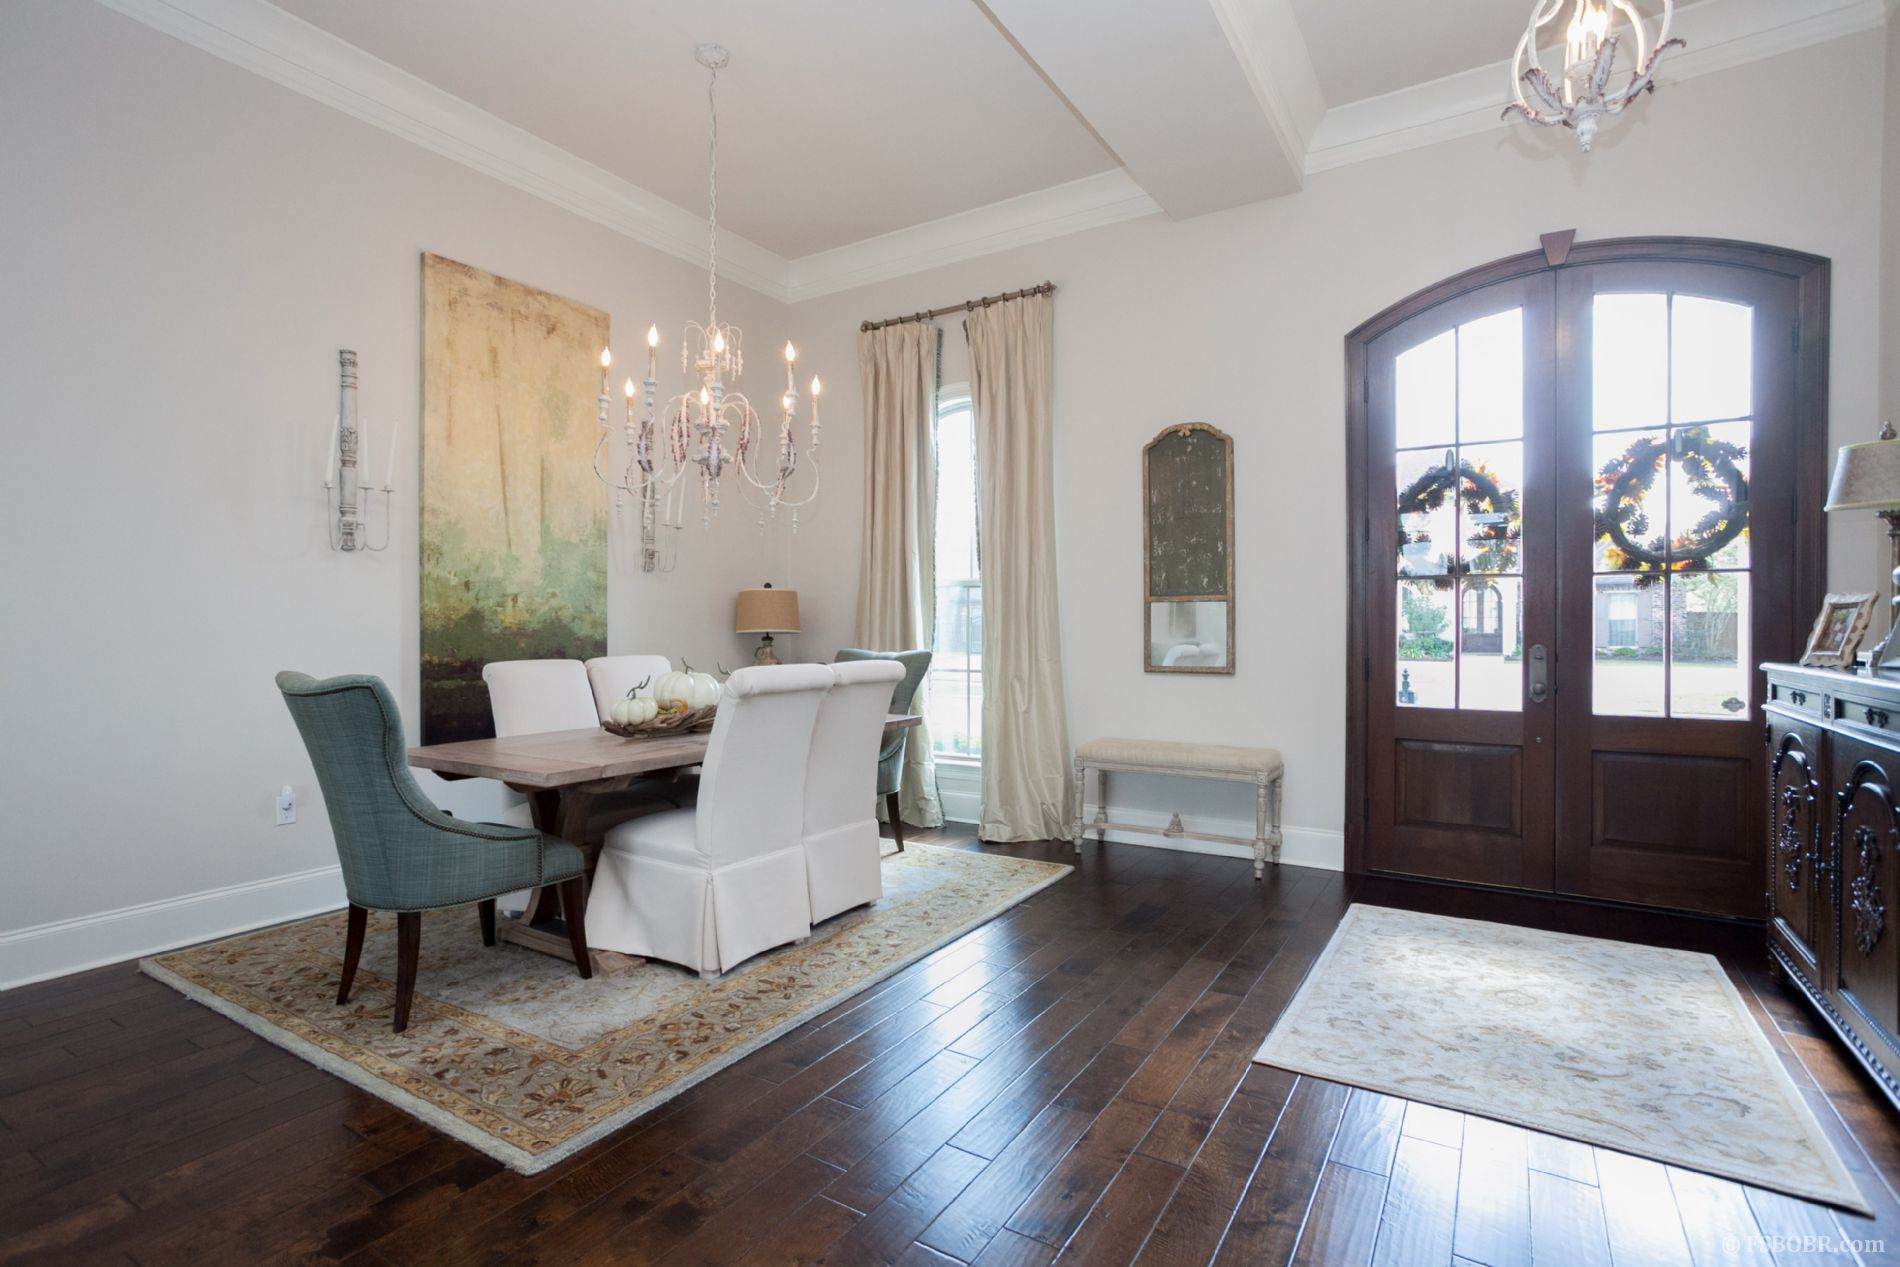 Entertainer s dream home PRICED BELOW APPRAISAL Quail